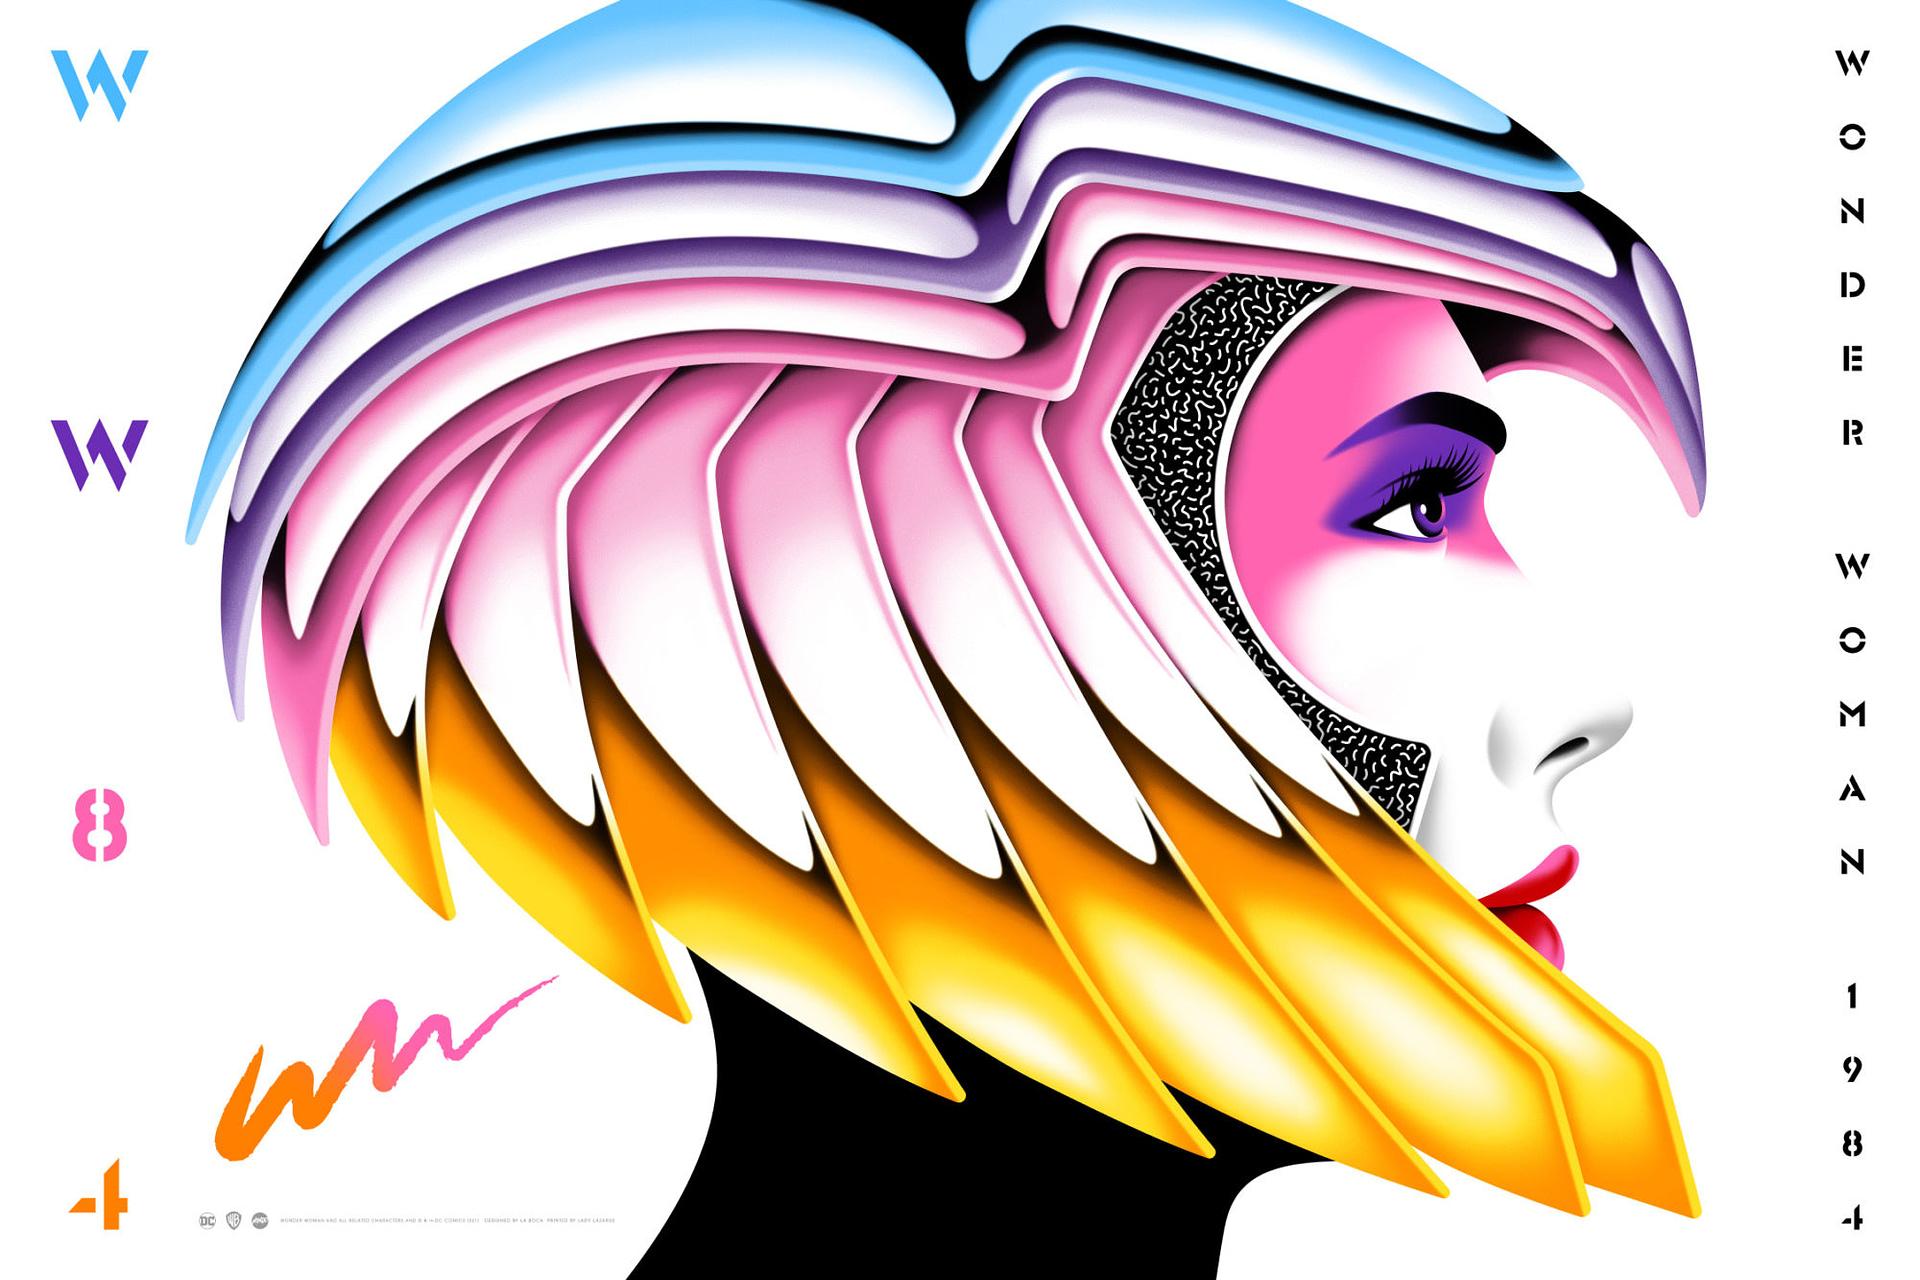 Mondo Music Release of The Week: Wonder Woman 84